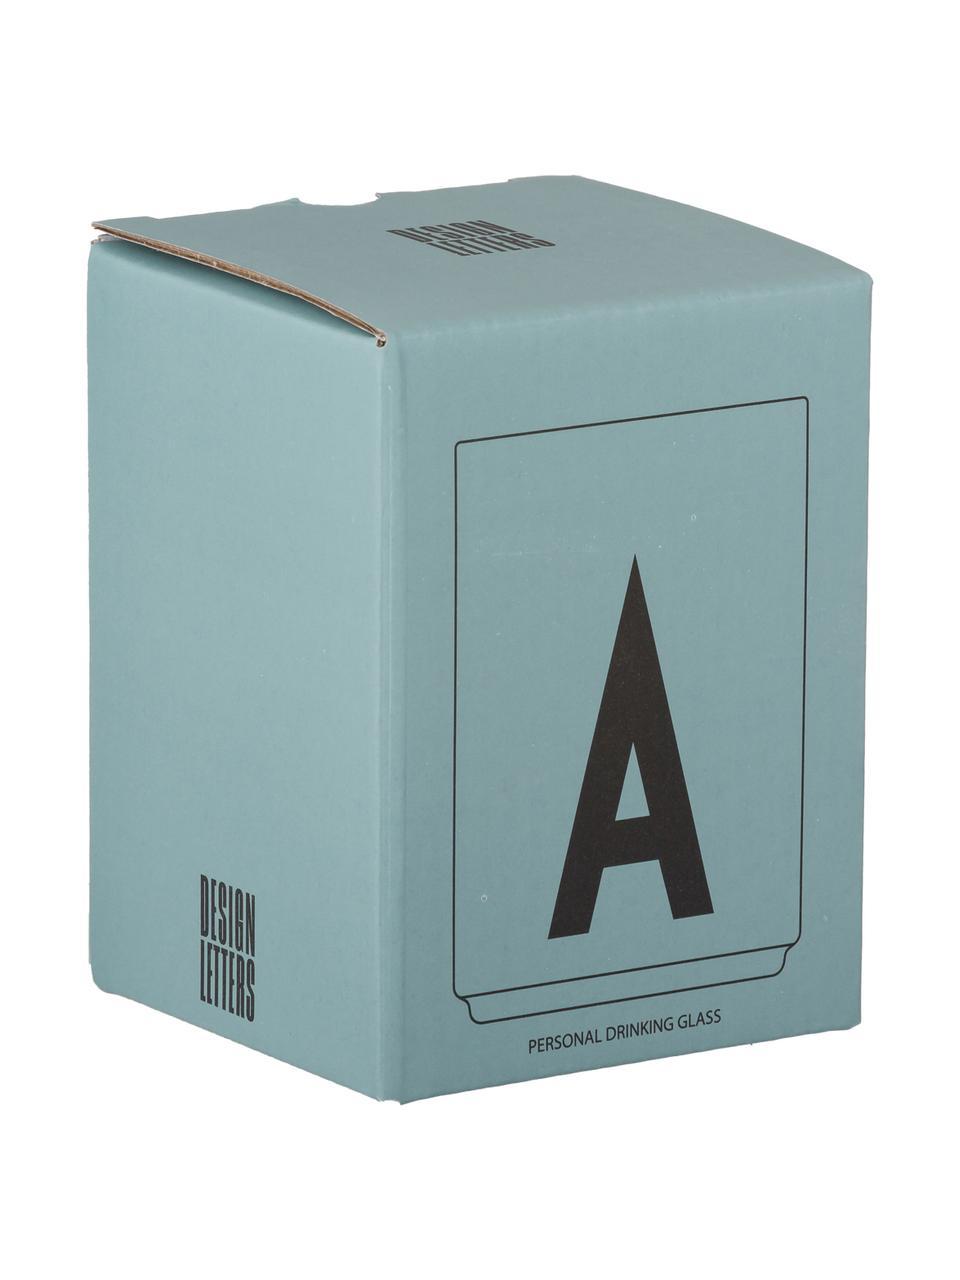 Design waterglas Personal met letters (varianten van A tot Z), Borosilicaatglas, Transparant, zwart, Waterglas A